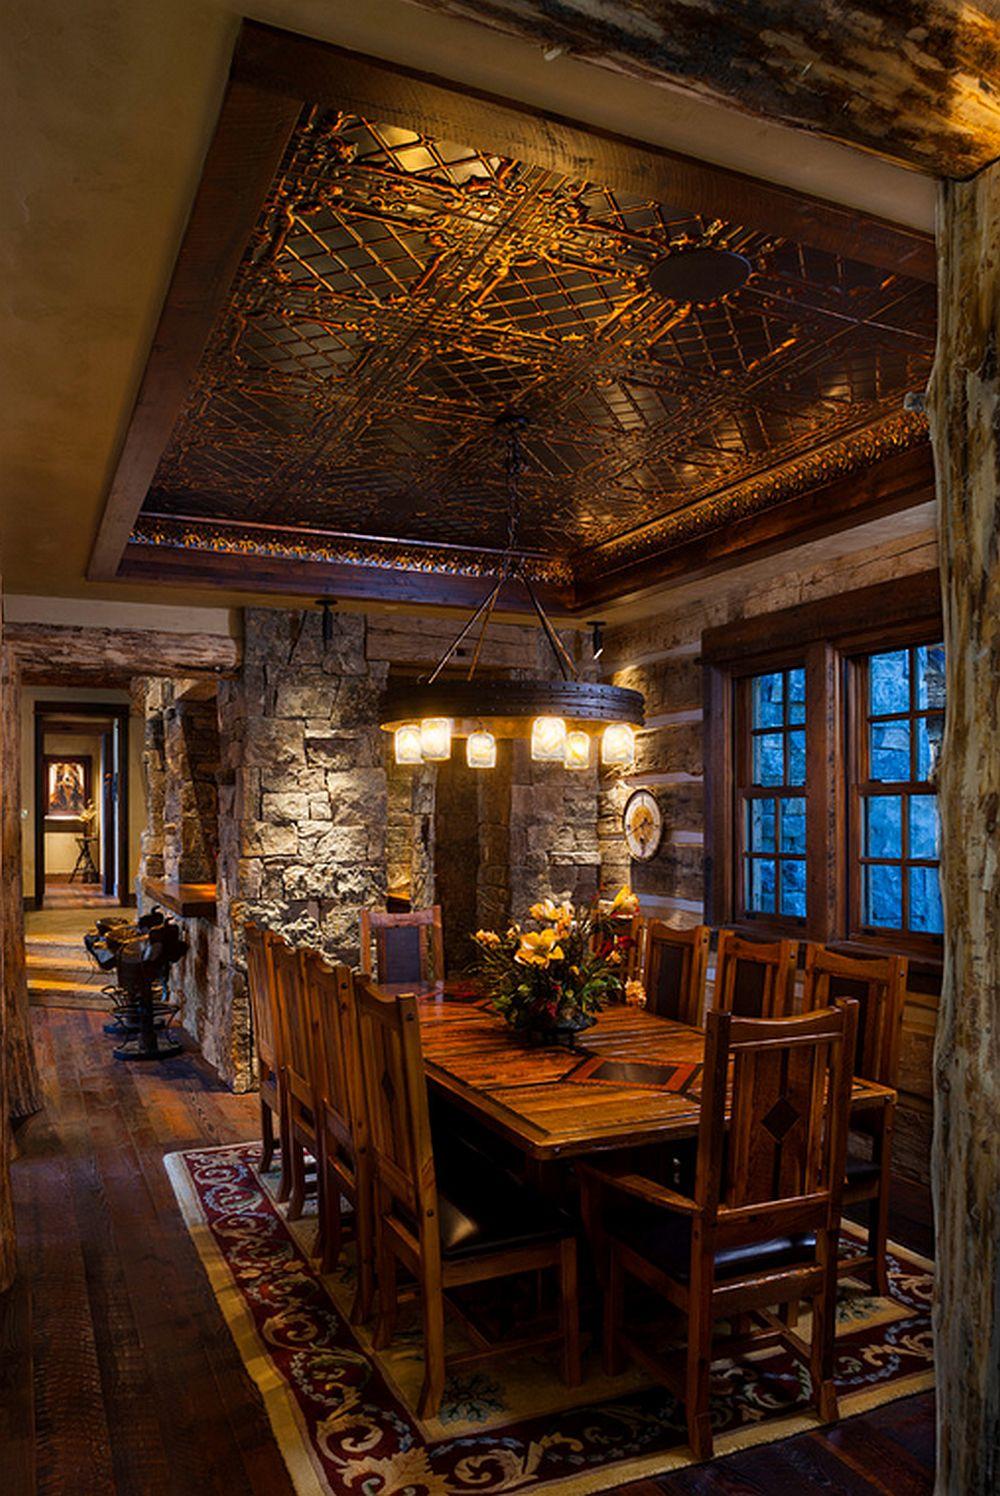 adelaparvu.com about Foxtail residence in Yellowstone Club, Big Sky, Montana, architect Faure Halvorsen Architects, Photo Karl Neumann (7)